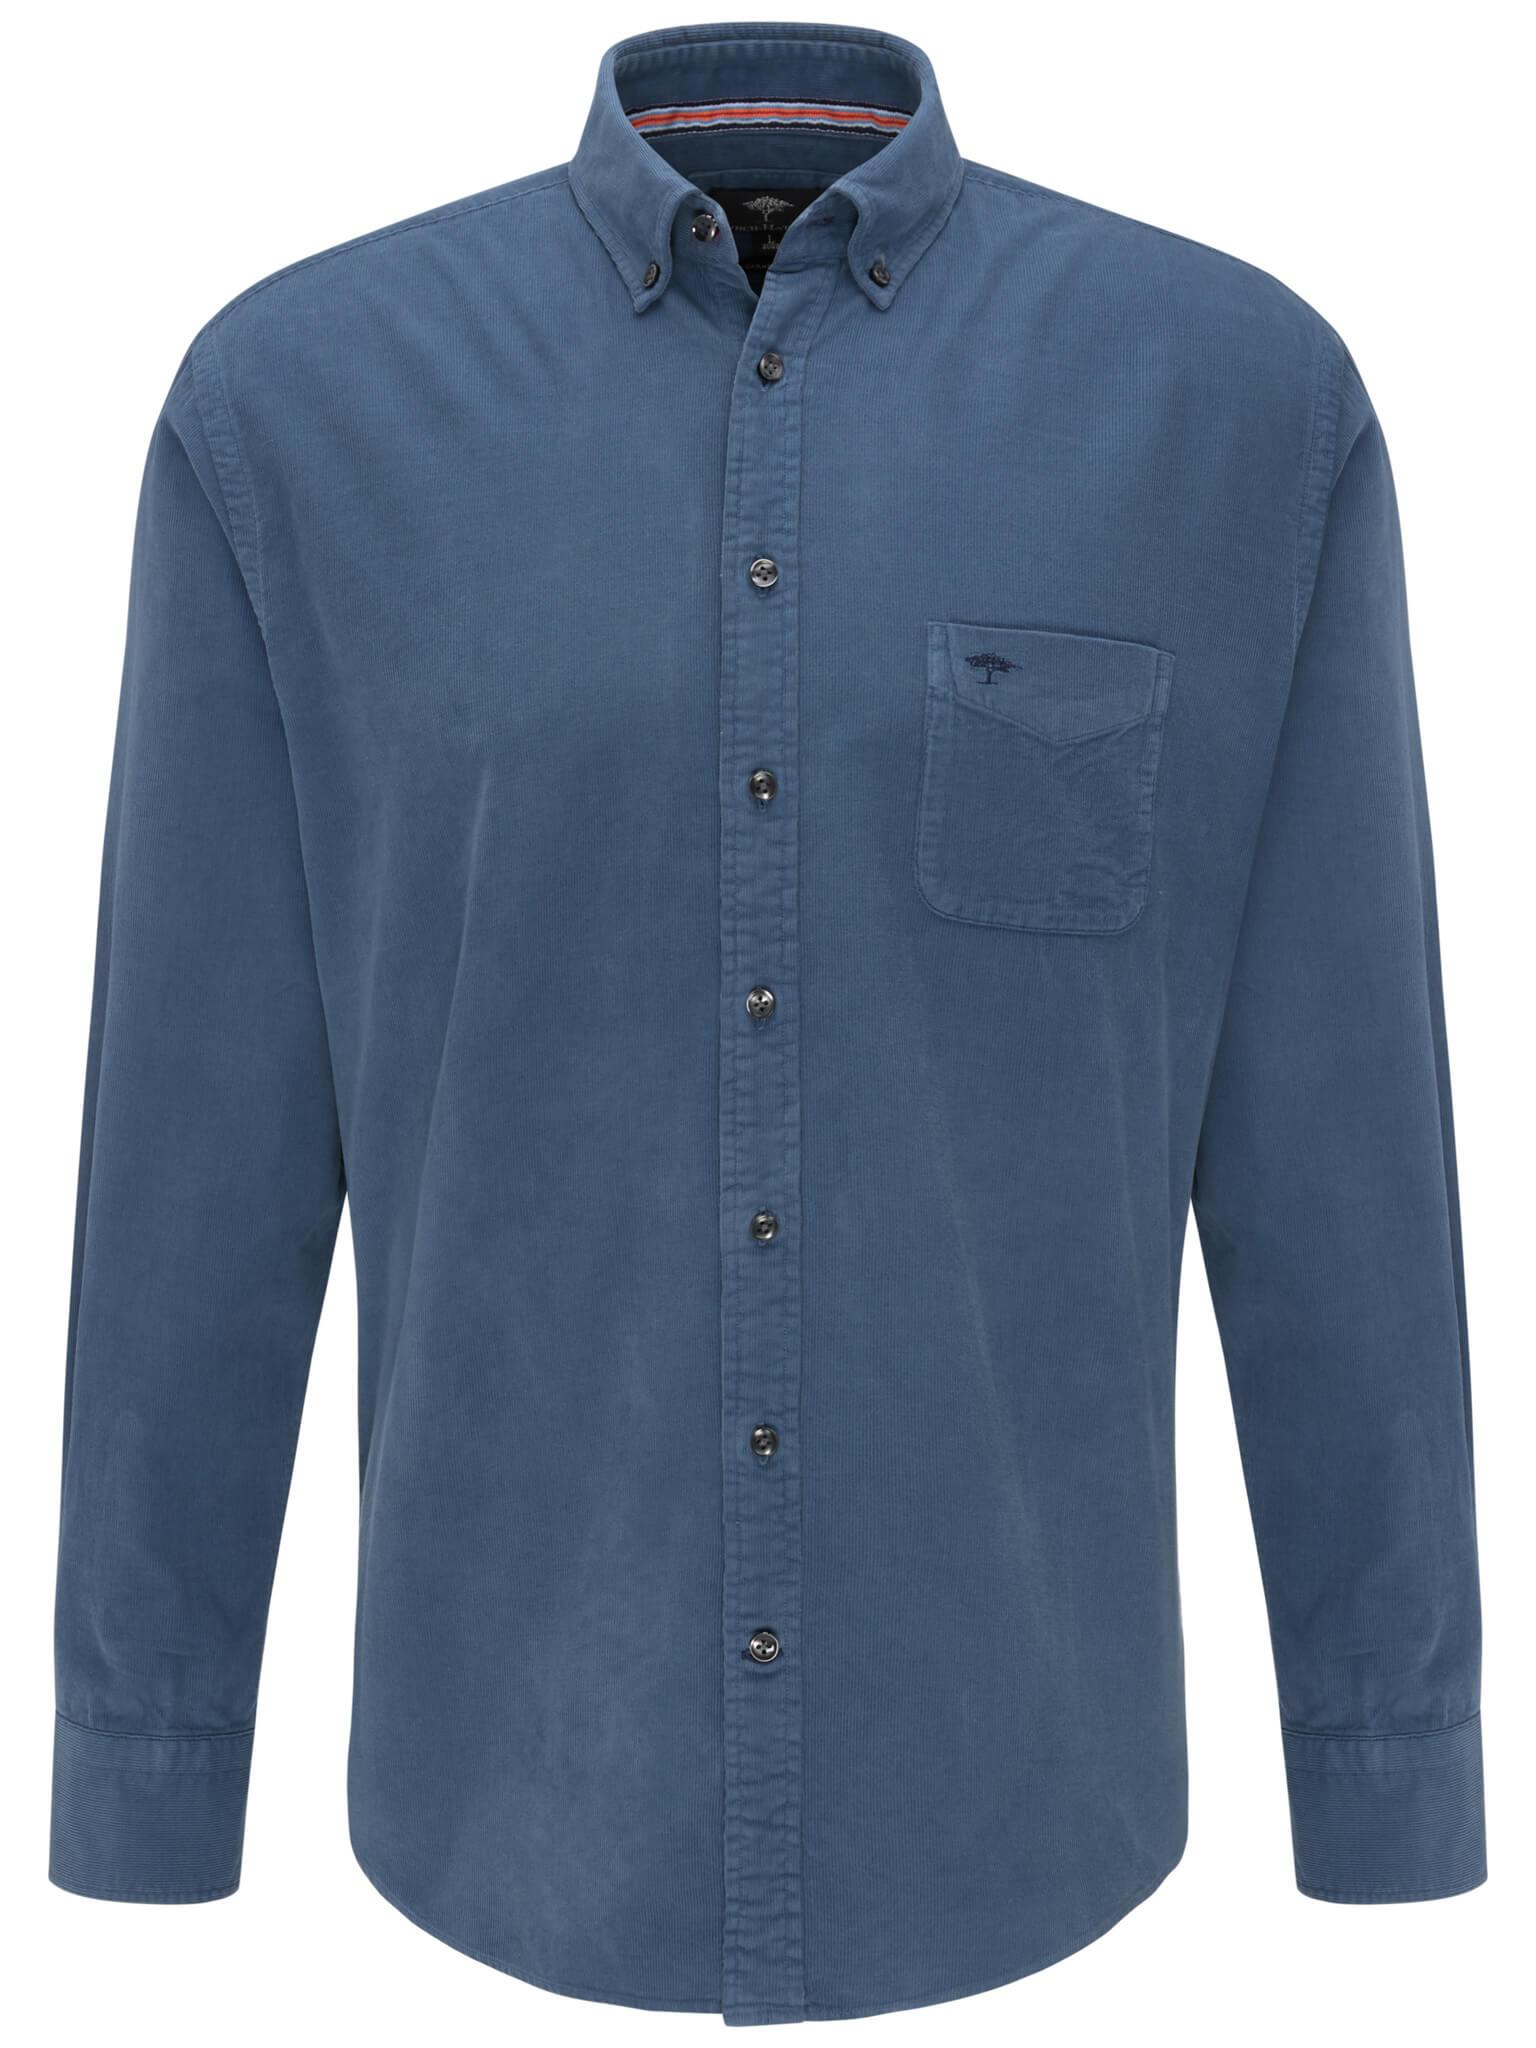 Fynch Hatton Fine Corduroy Shirt